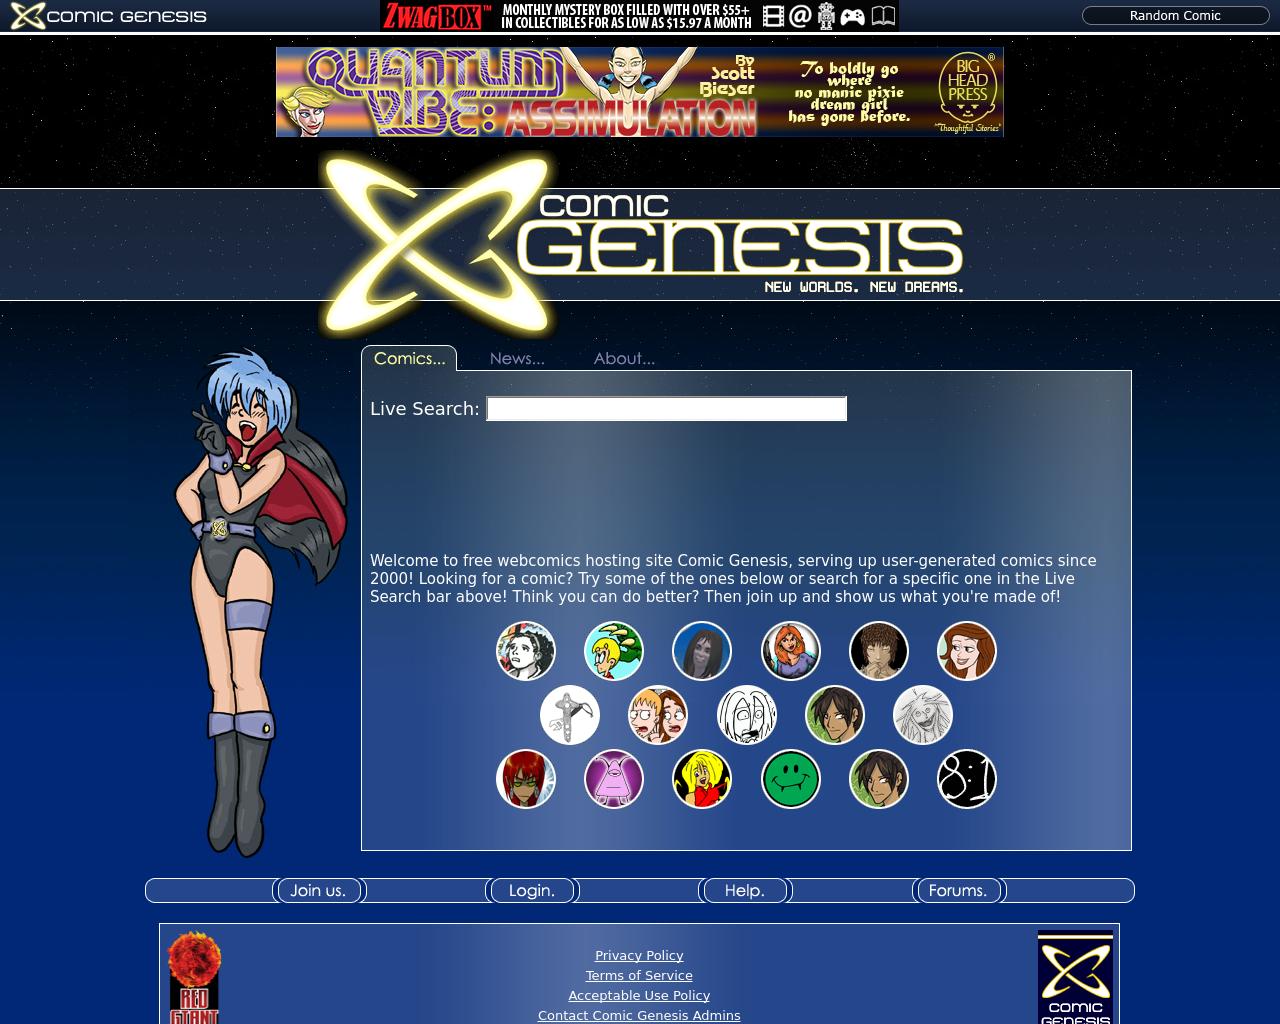 Comic-Genesis-Advertising-Reviews-Pricing